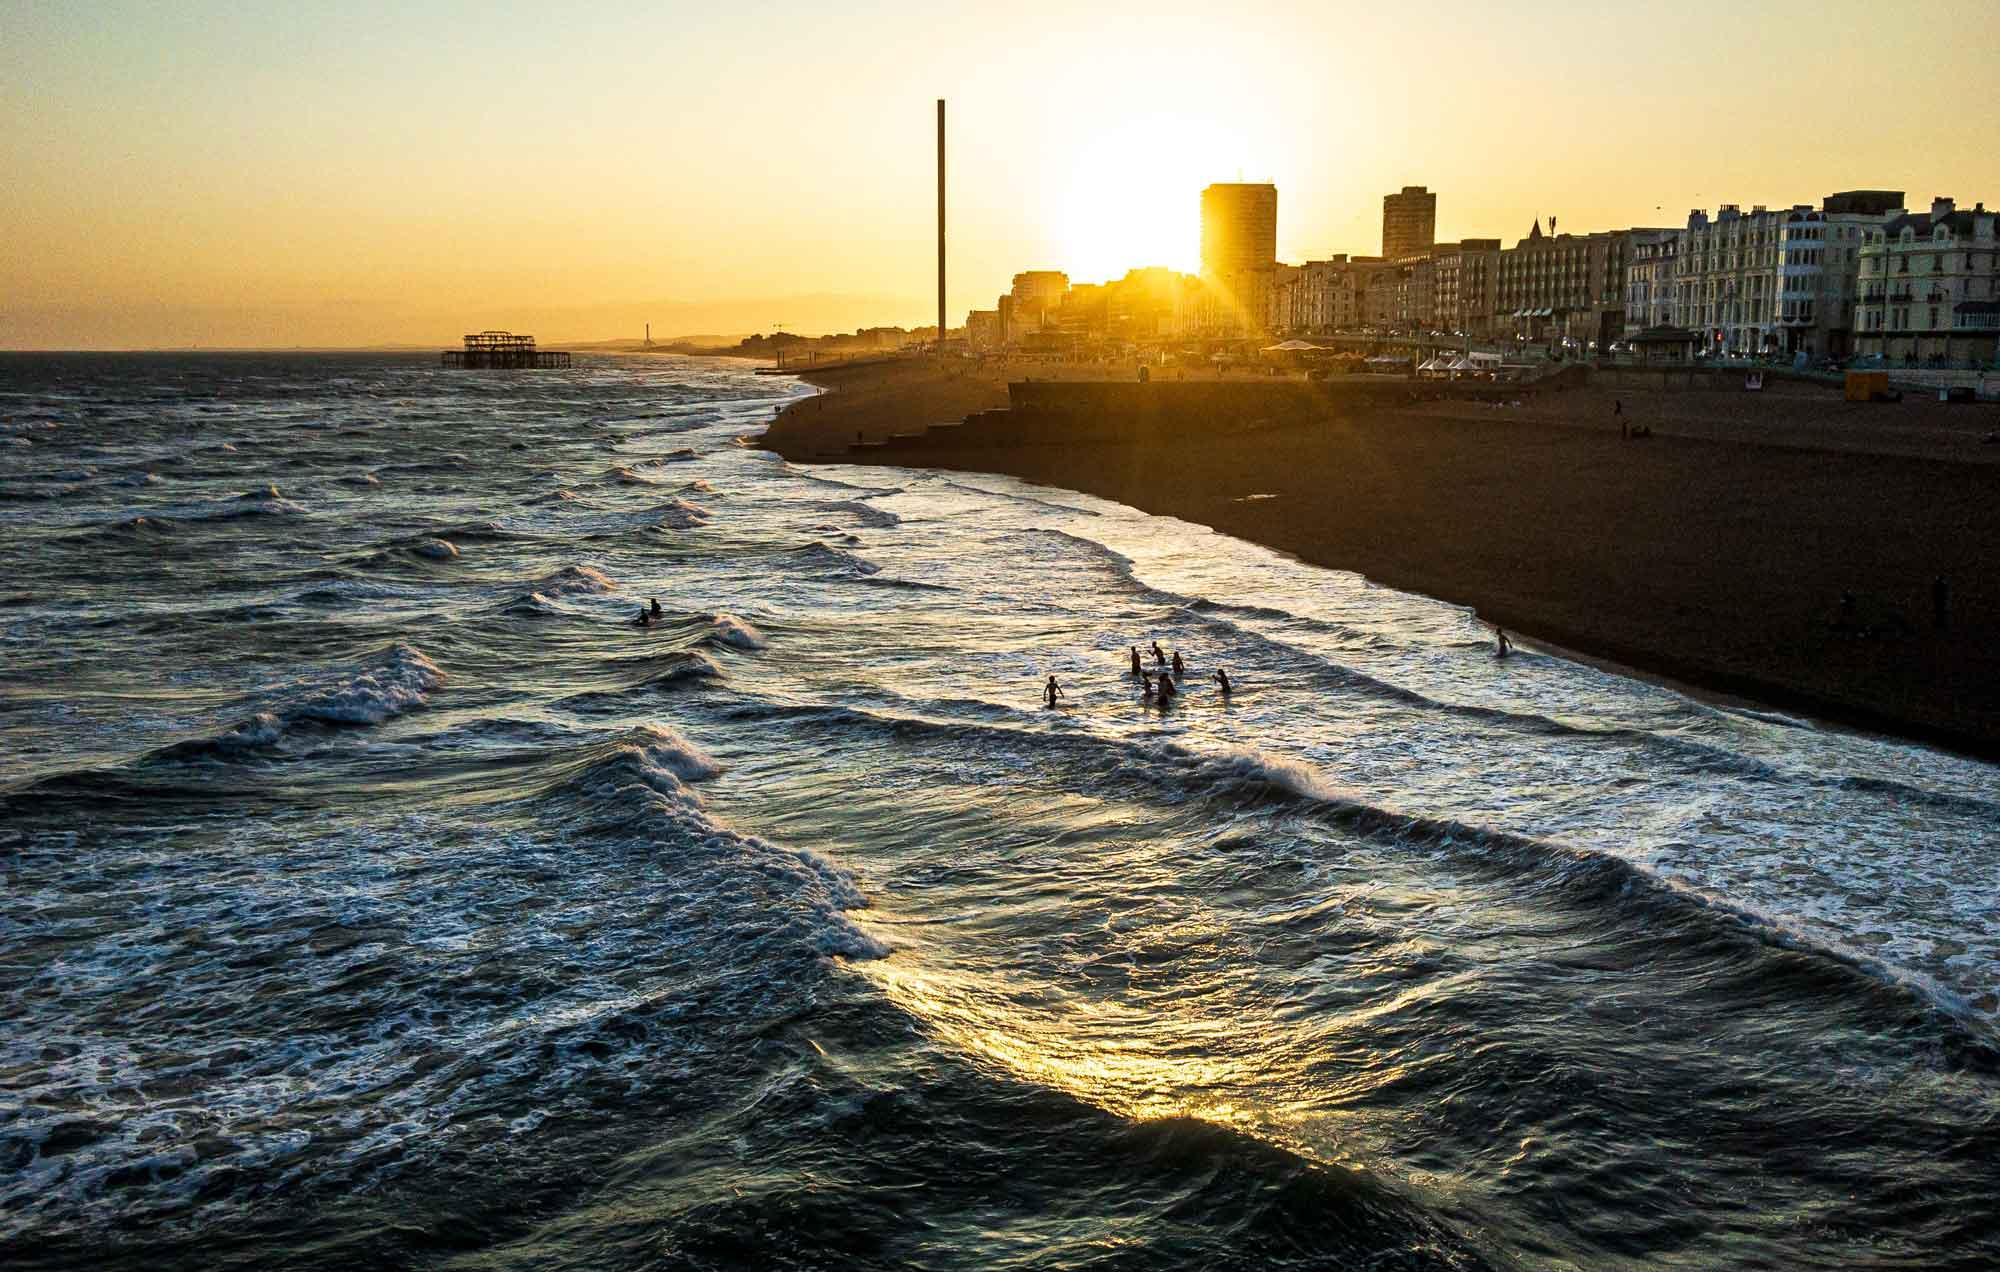 Brighton seafront at sundown